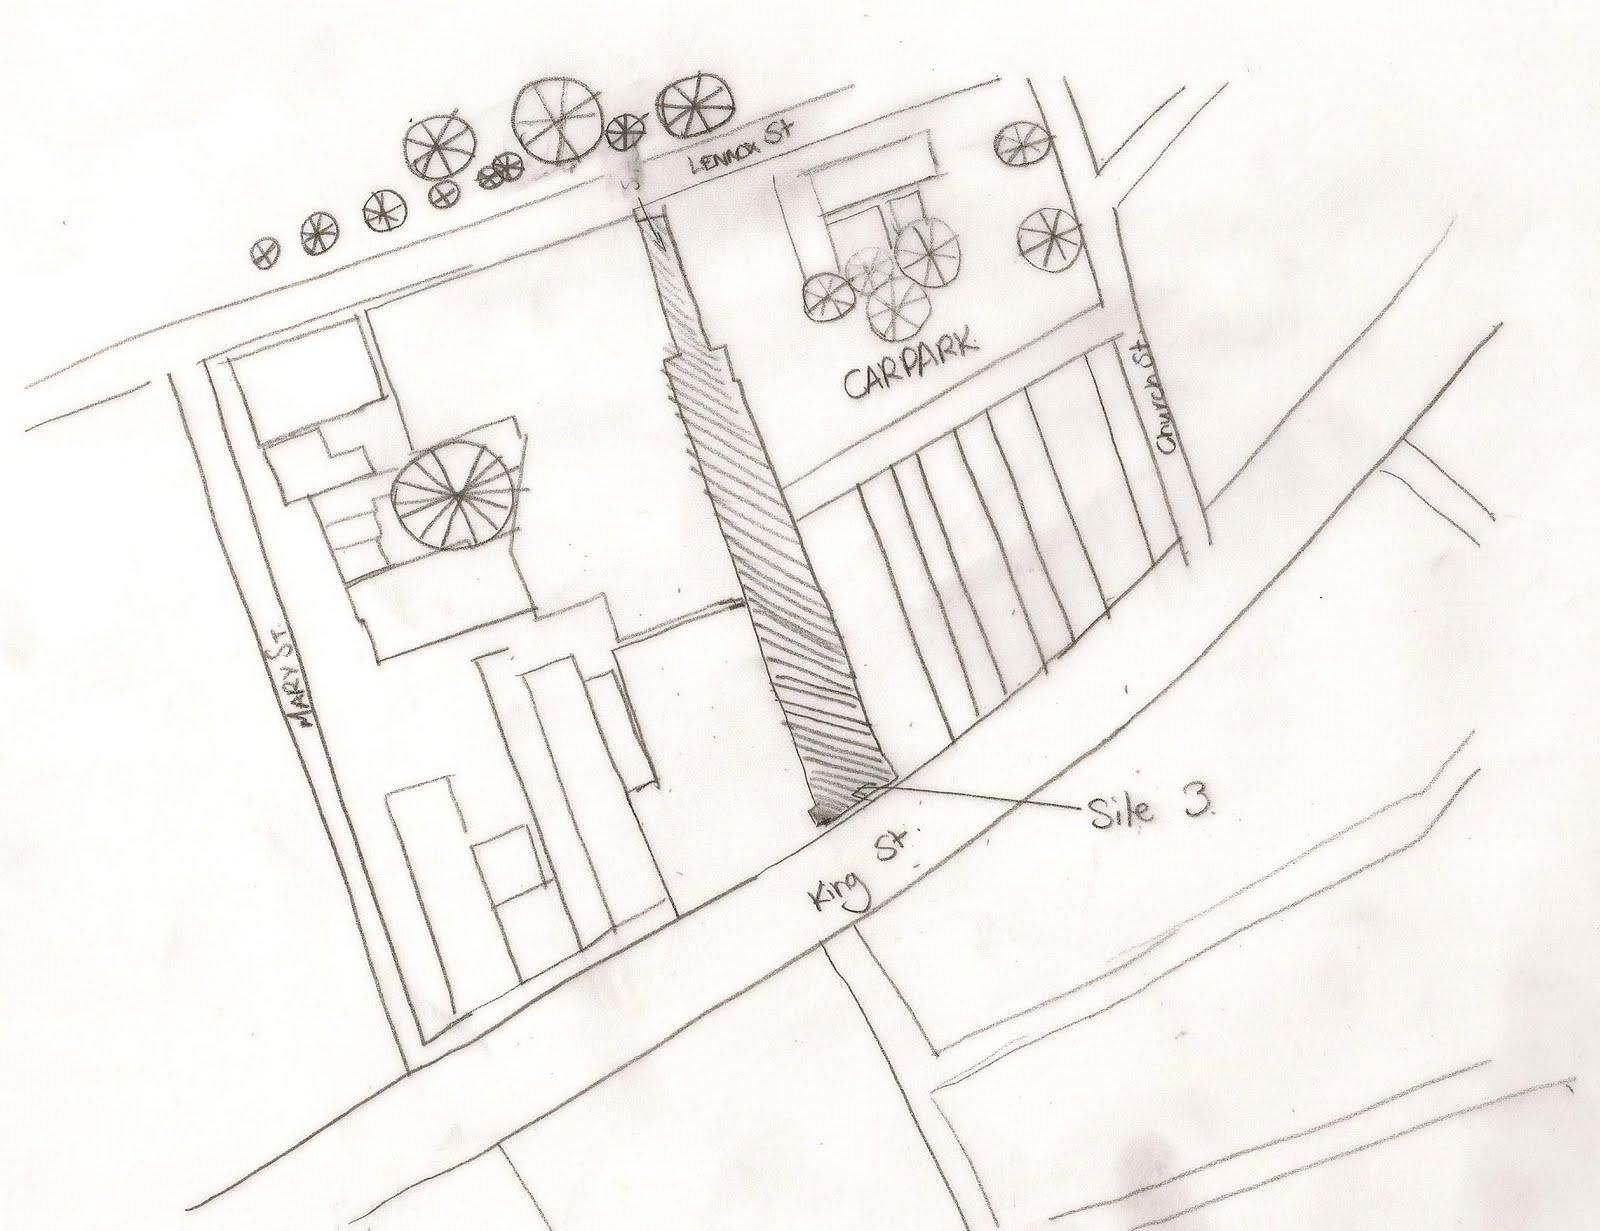 Architectural Studio 3 2010 rough sketches of site 3